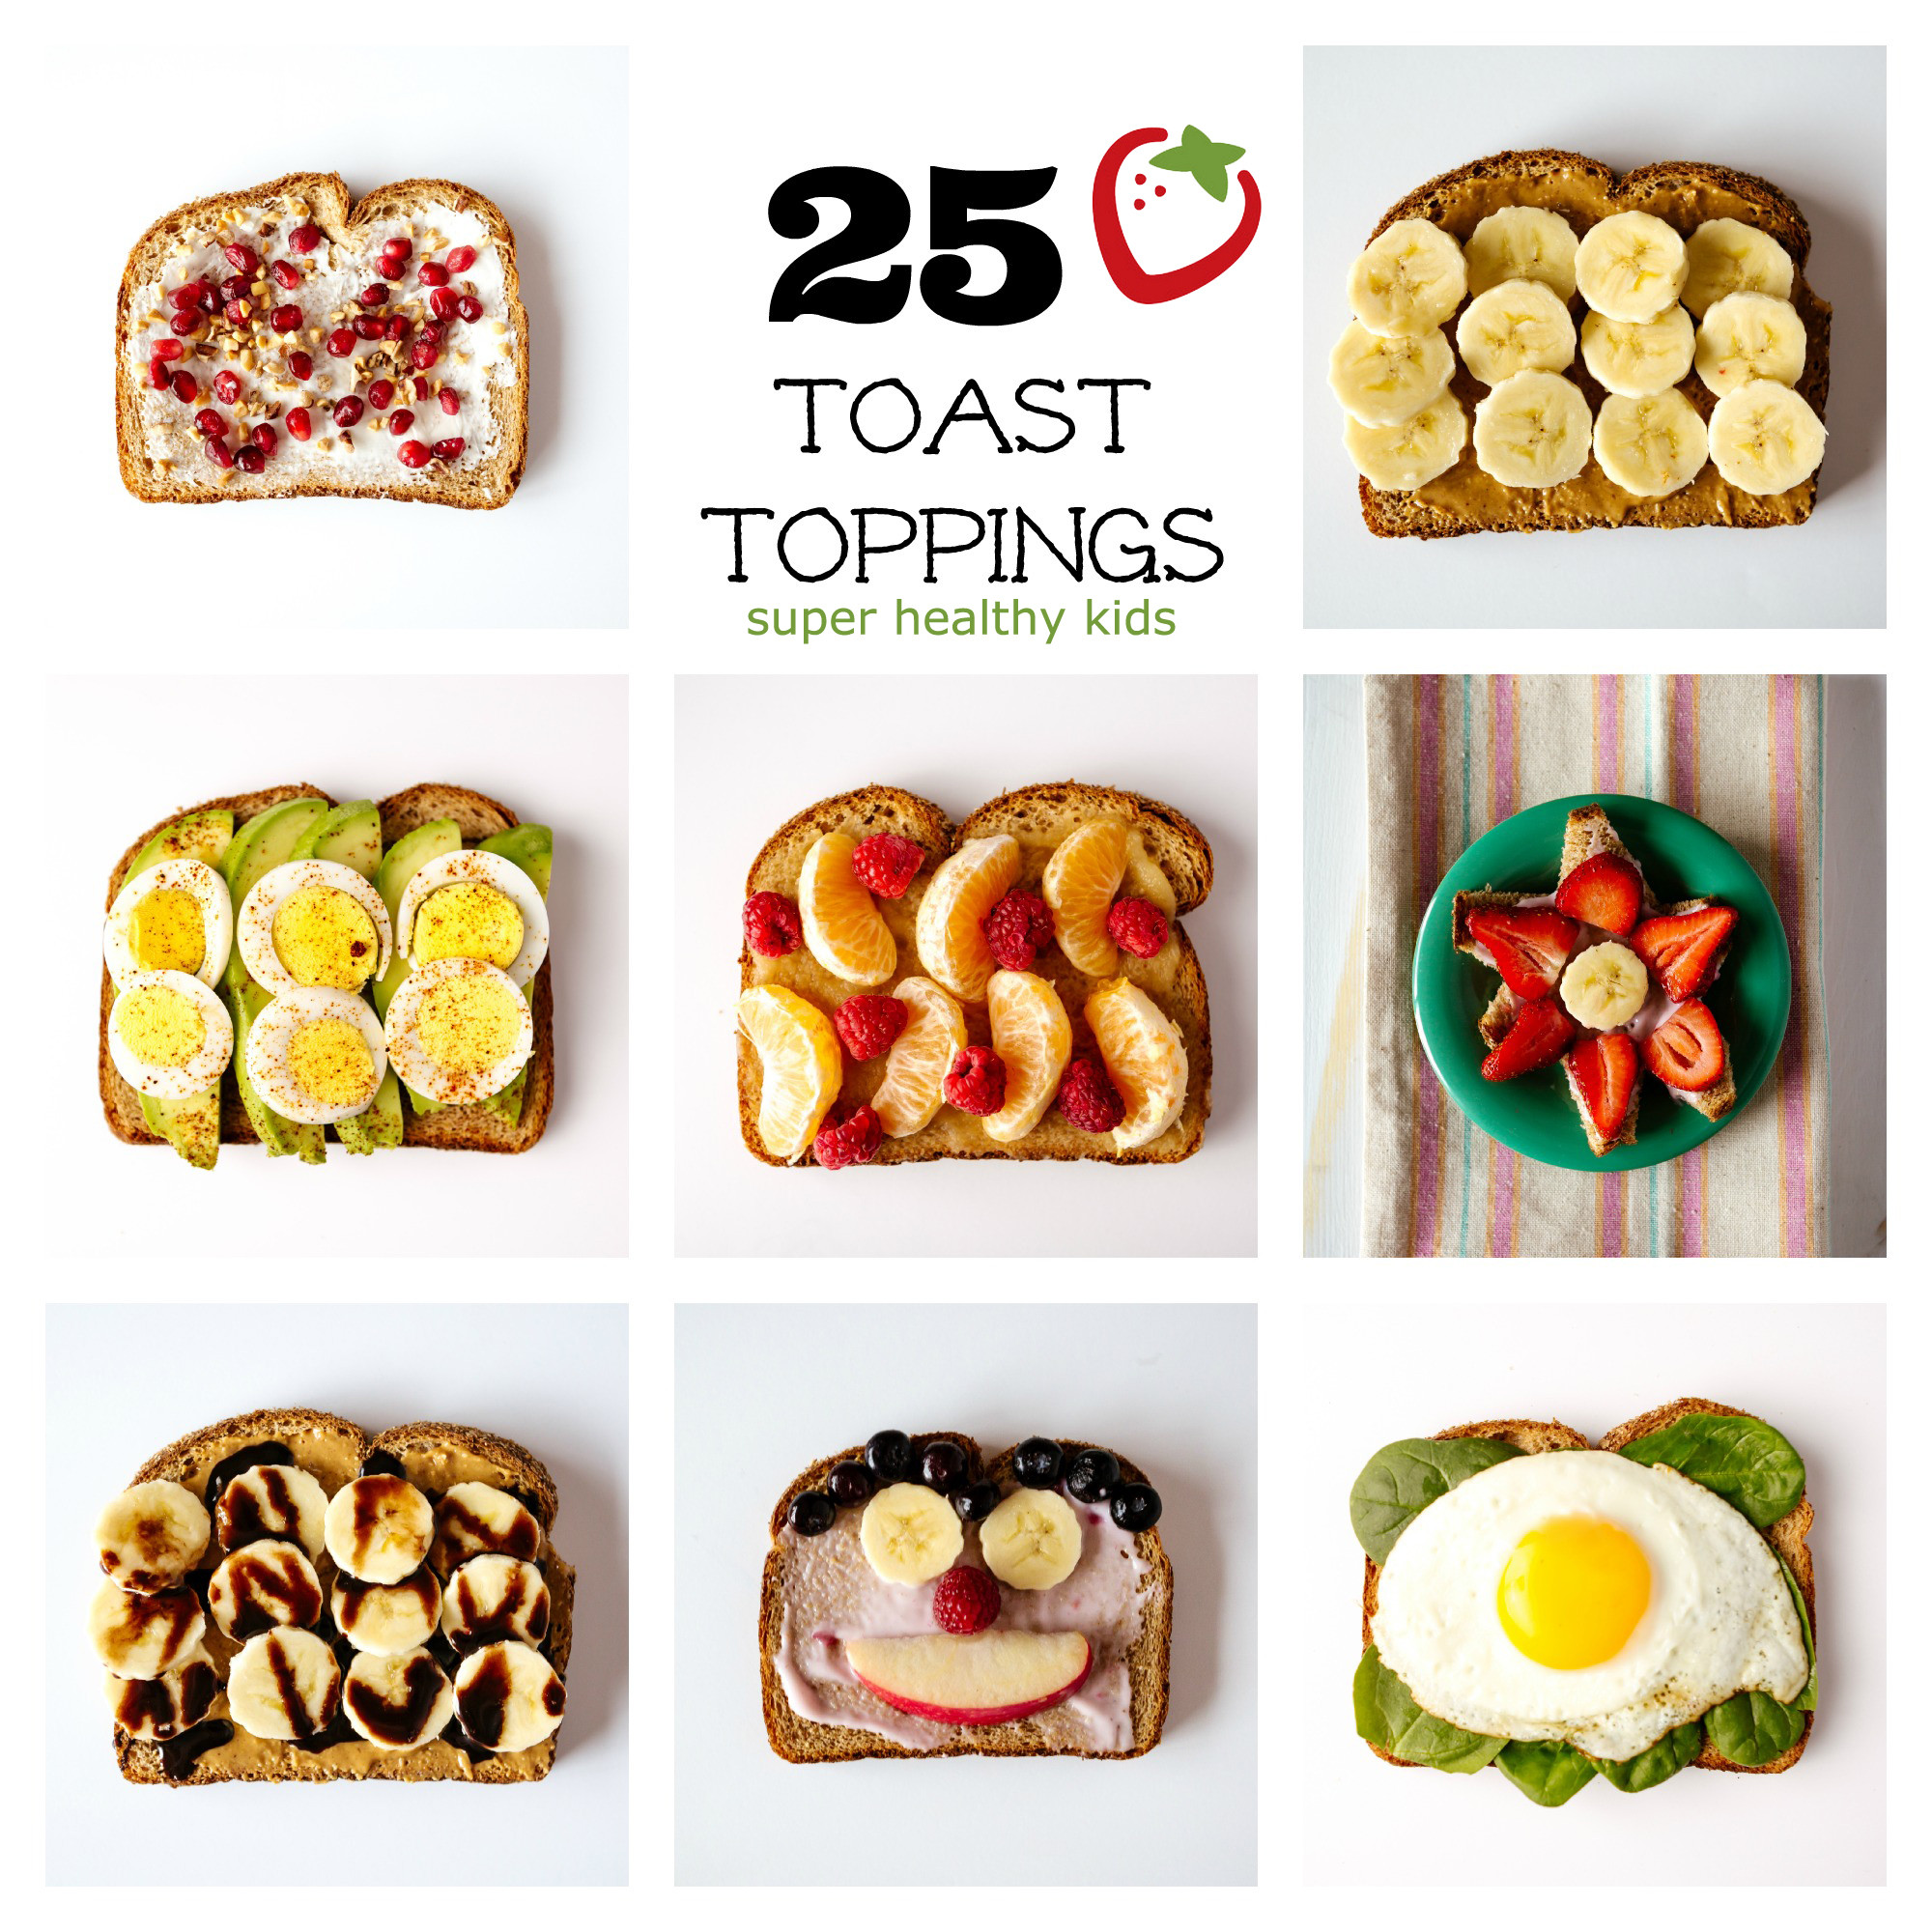 Super Healthy Breakfast  Toast Toppings 25 Ideas for a Healthy Breakfast